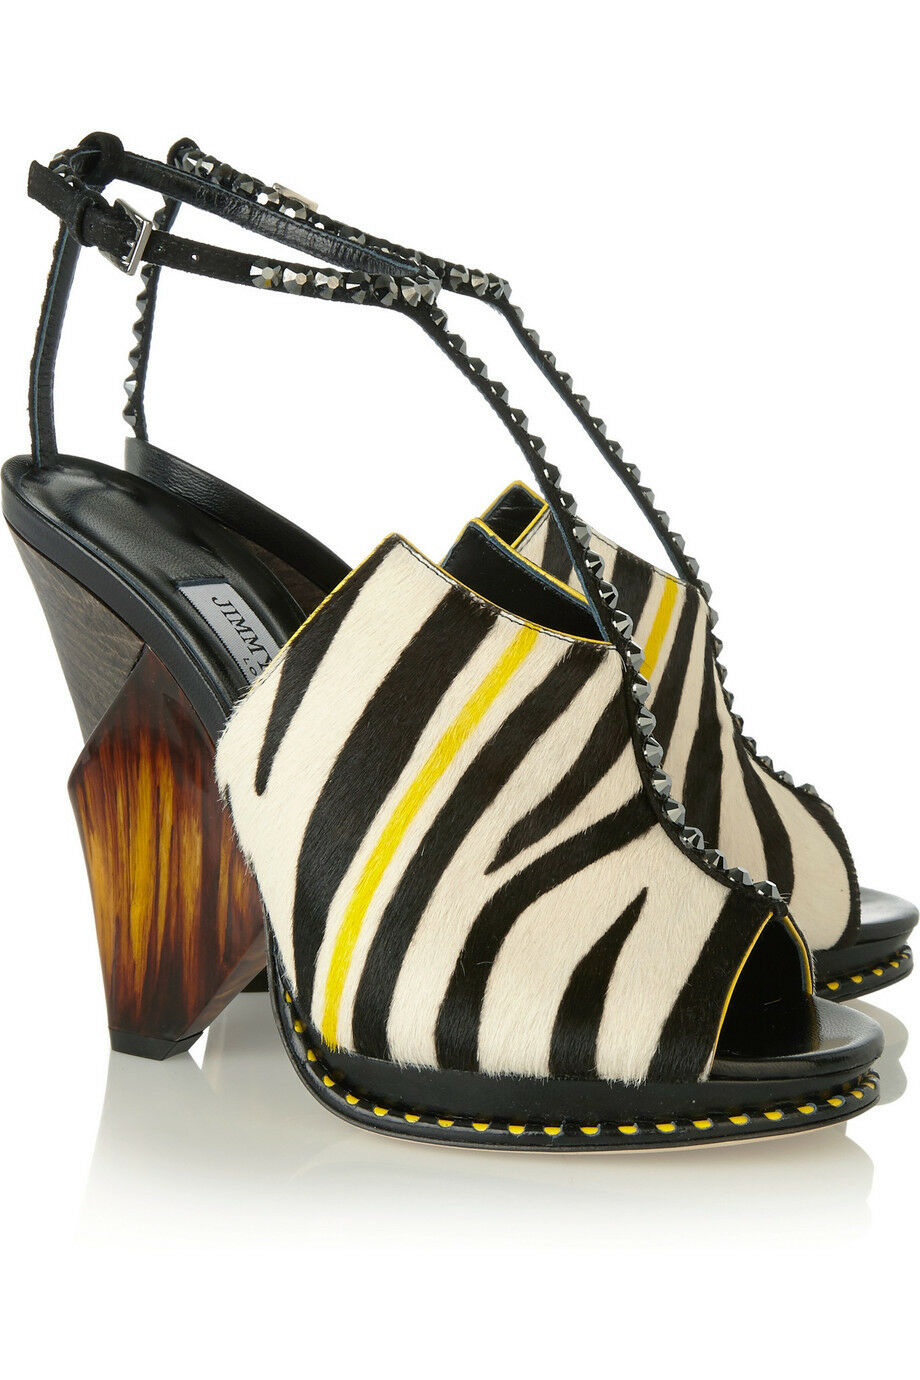 AUTH NIB JIMMY JIMMY JIMMY CHOO Kascade calf hair and leather Zebra T-bar sandals Sz 36.5 f99f75